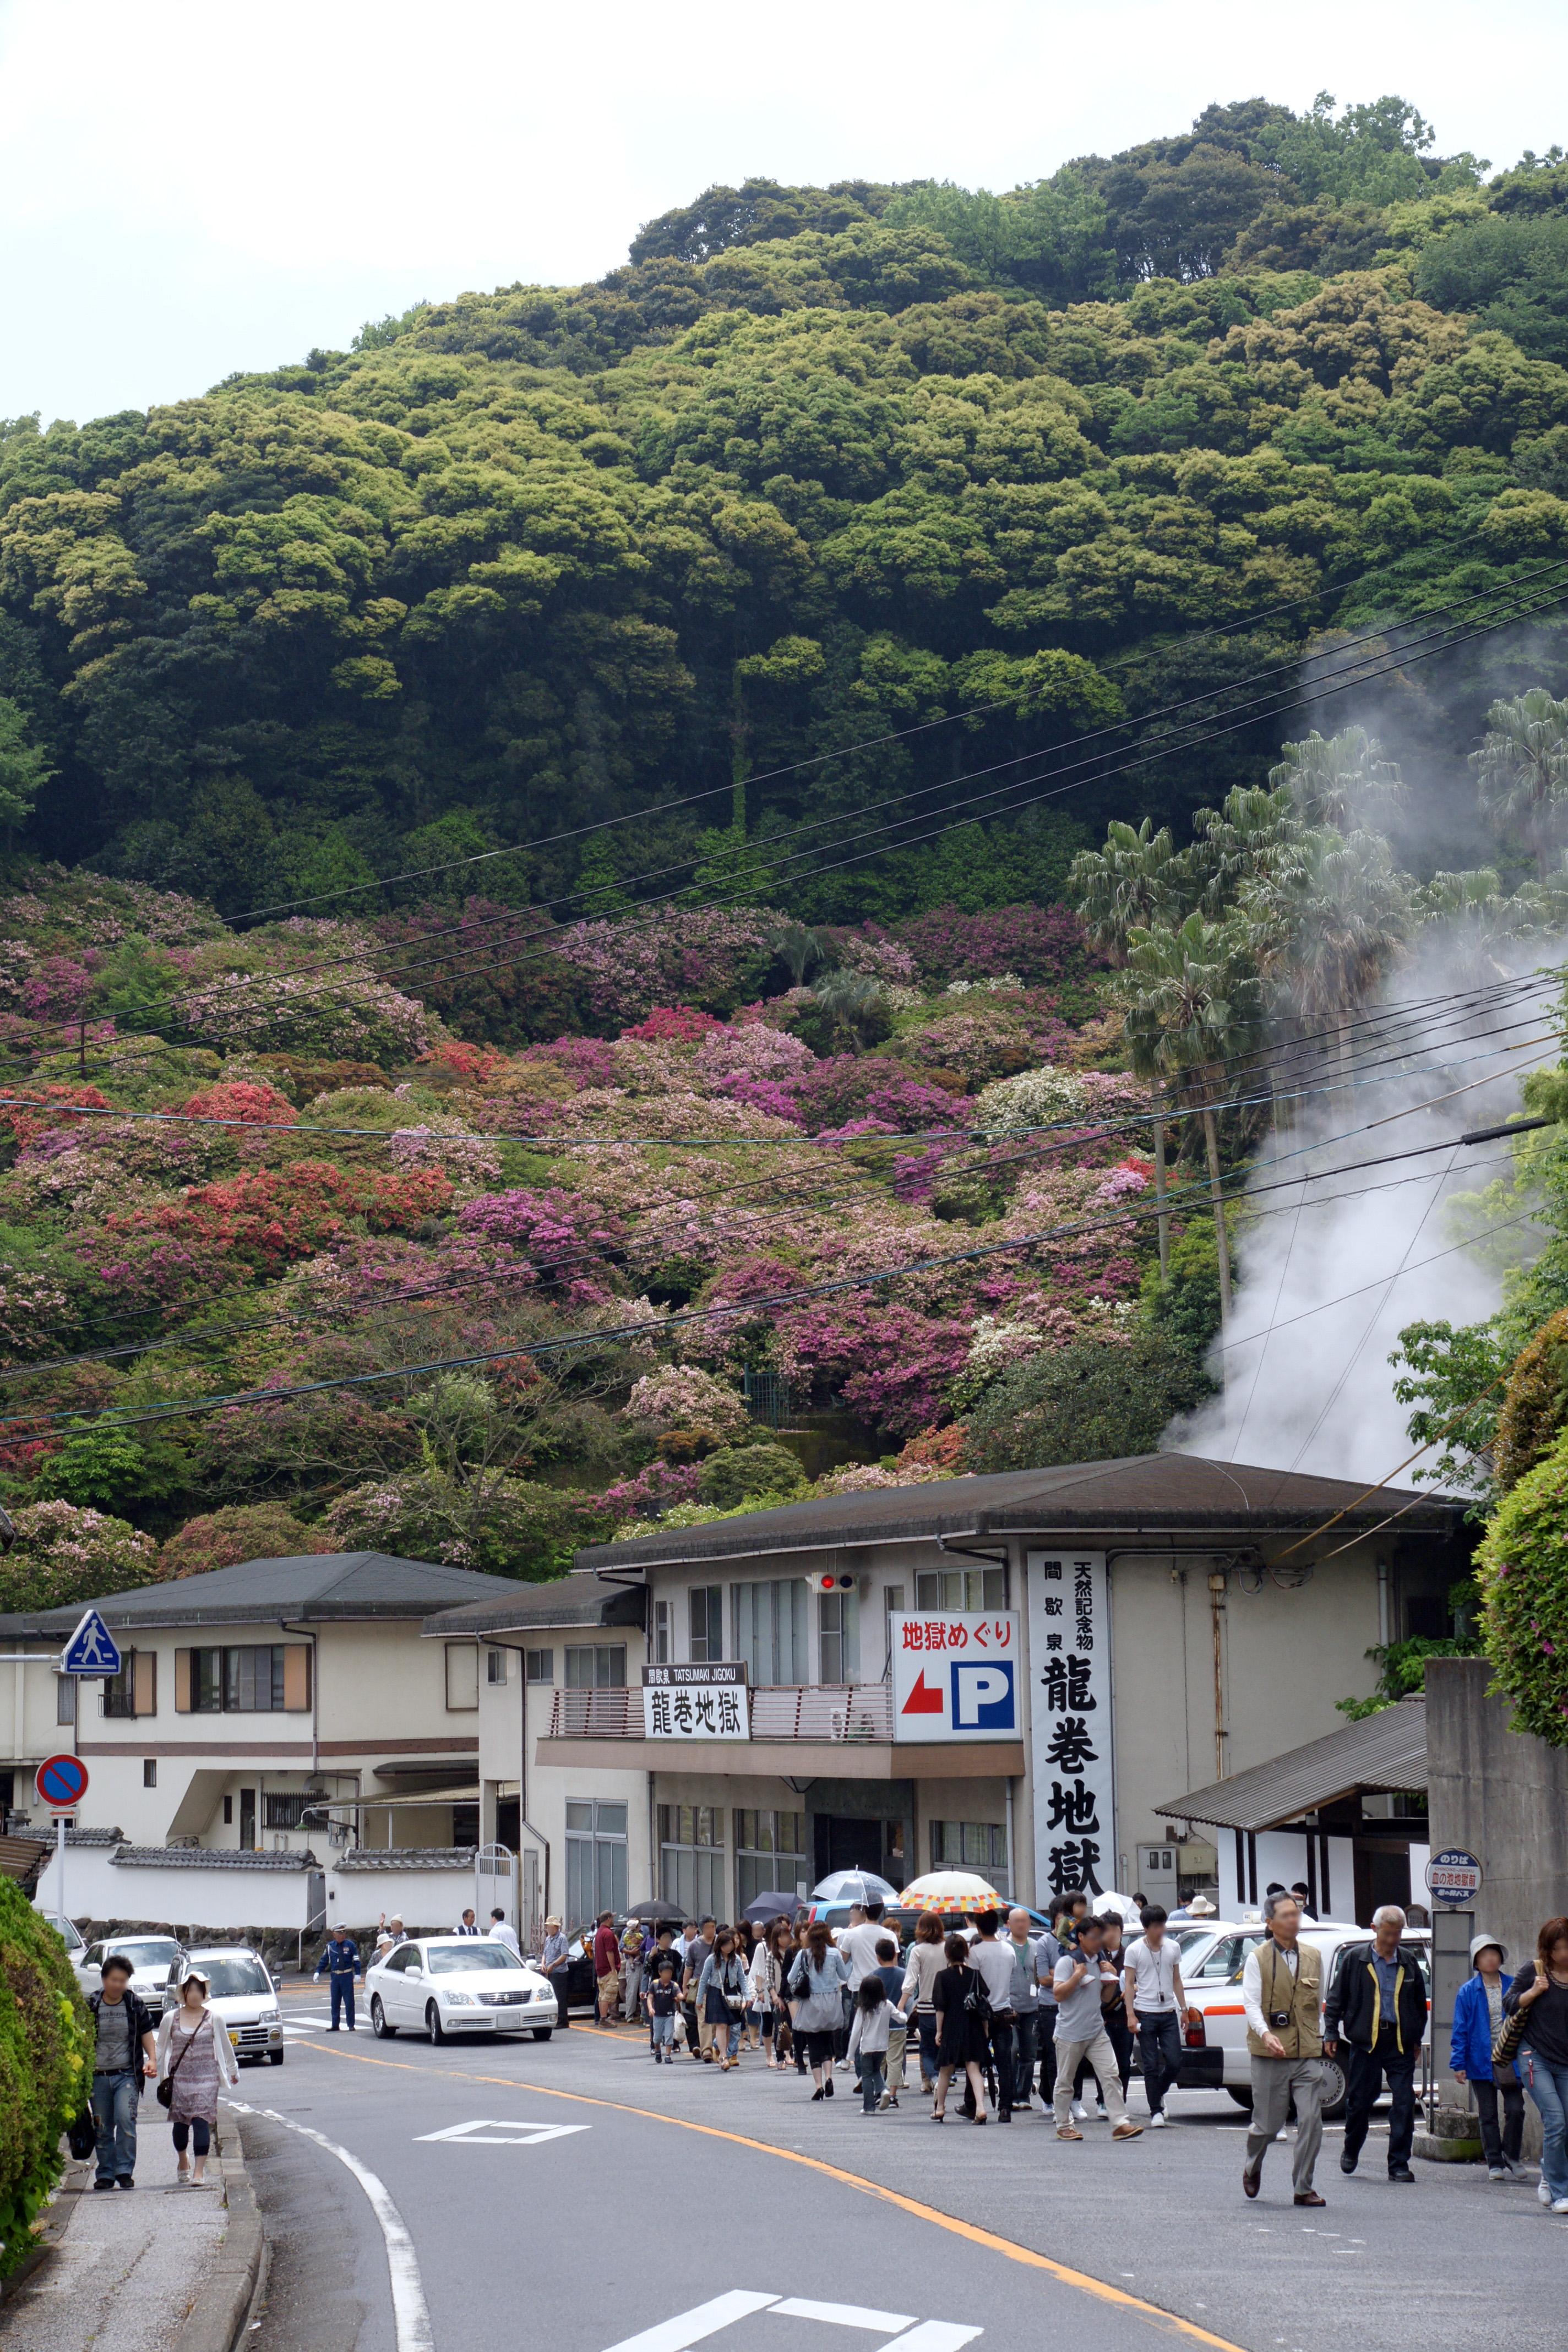 File:Beppu Tatsumaki-jigoku04n4272.jpg - Wikimedia Commons